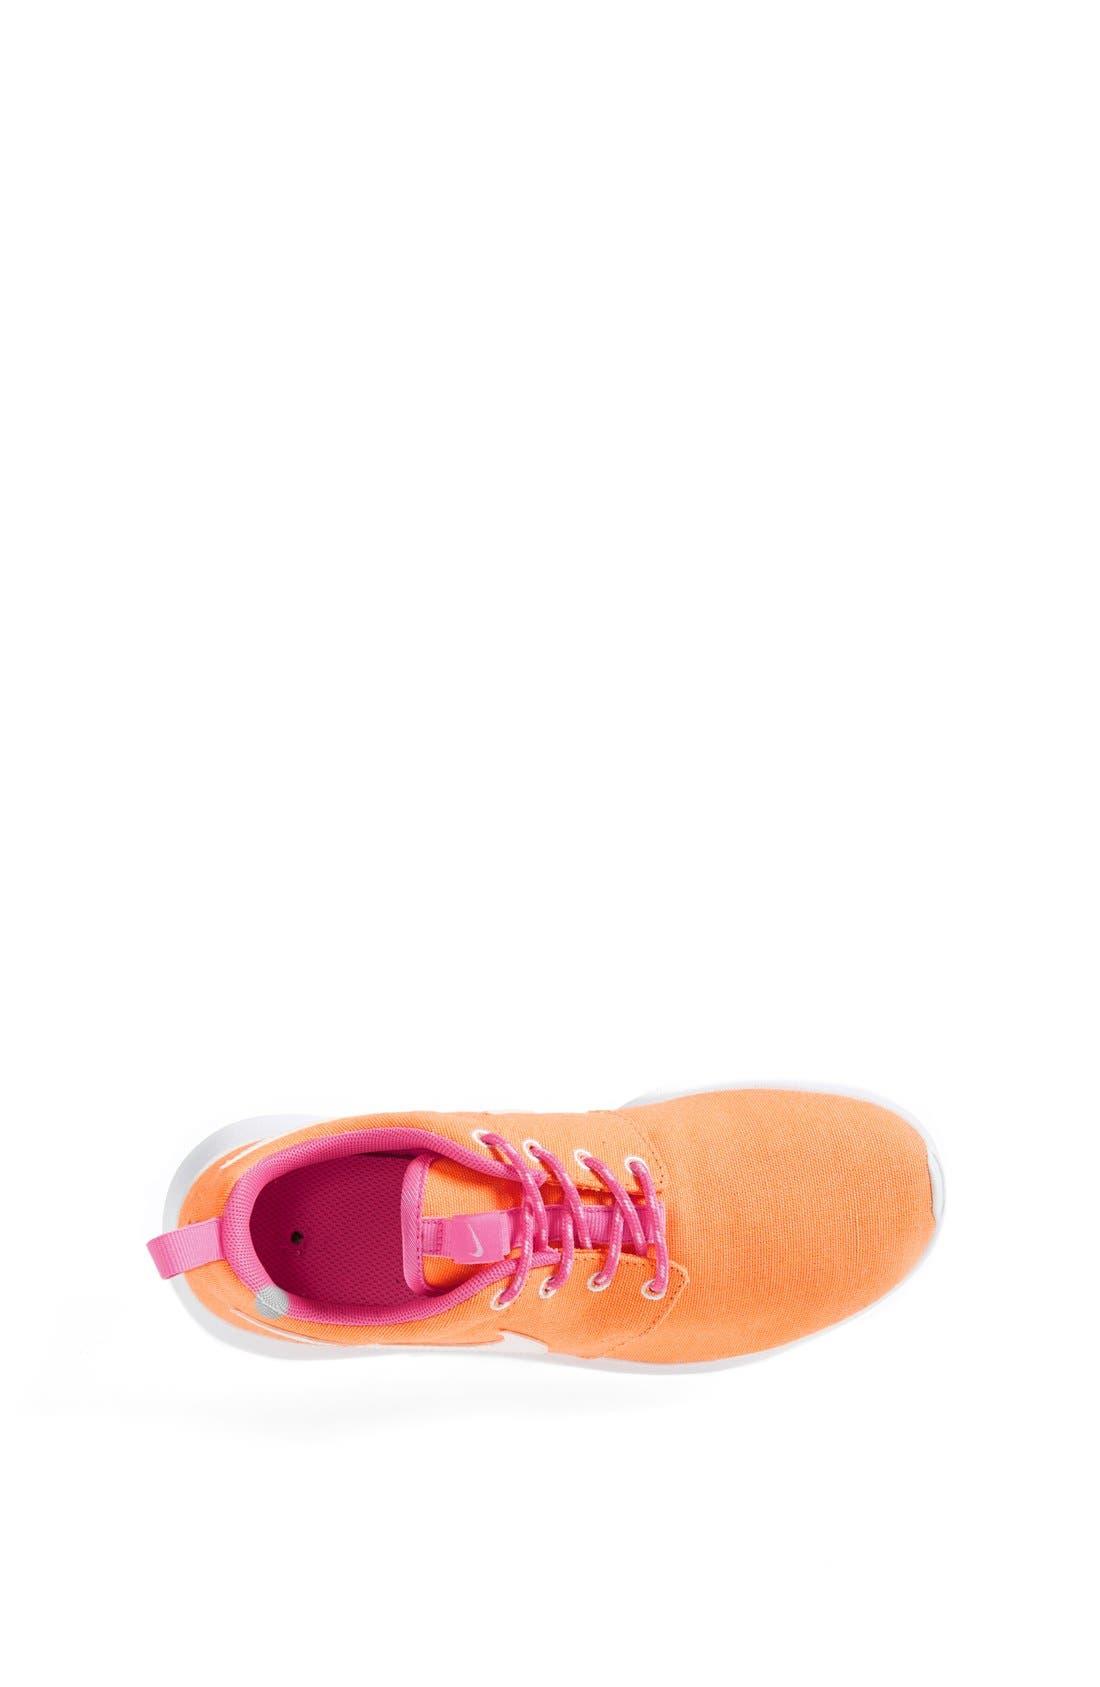 'Roshe Run' Athletic Shoe,                             Alternate thumbnail 183, color,